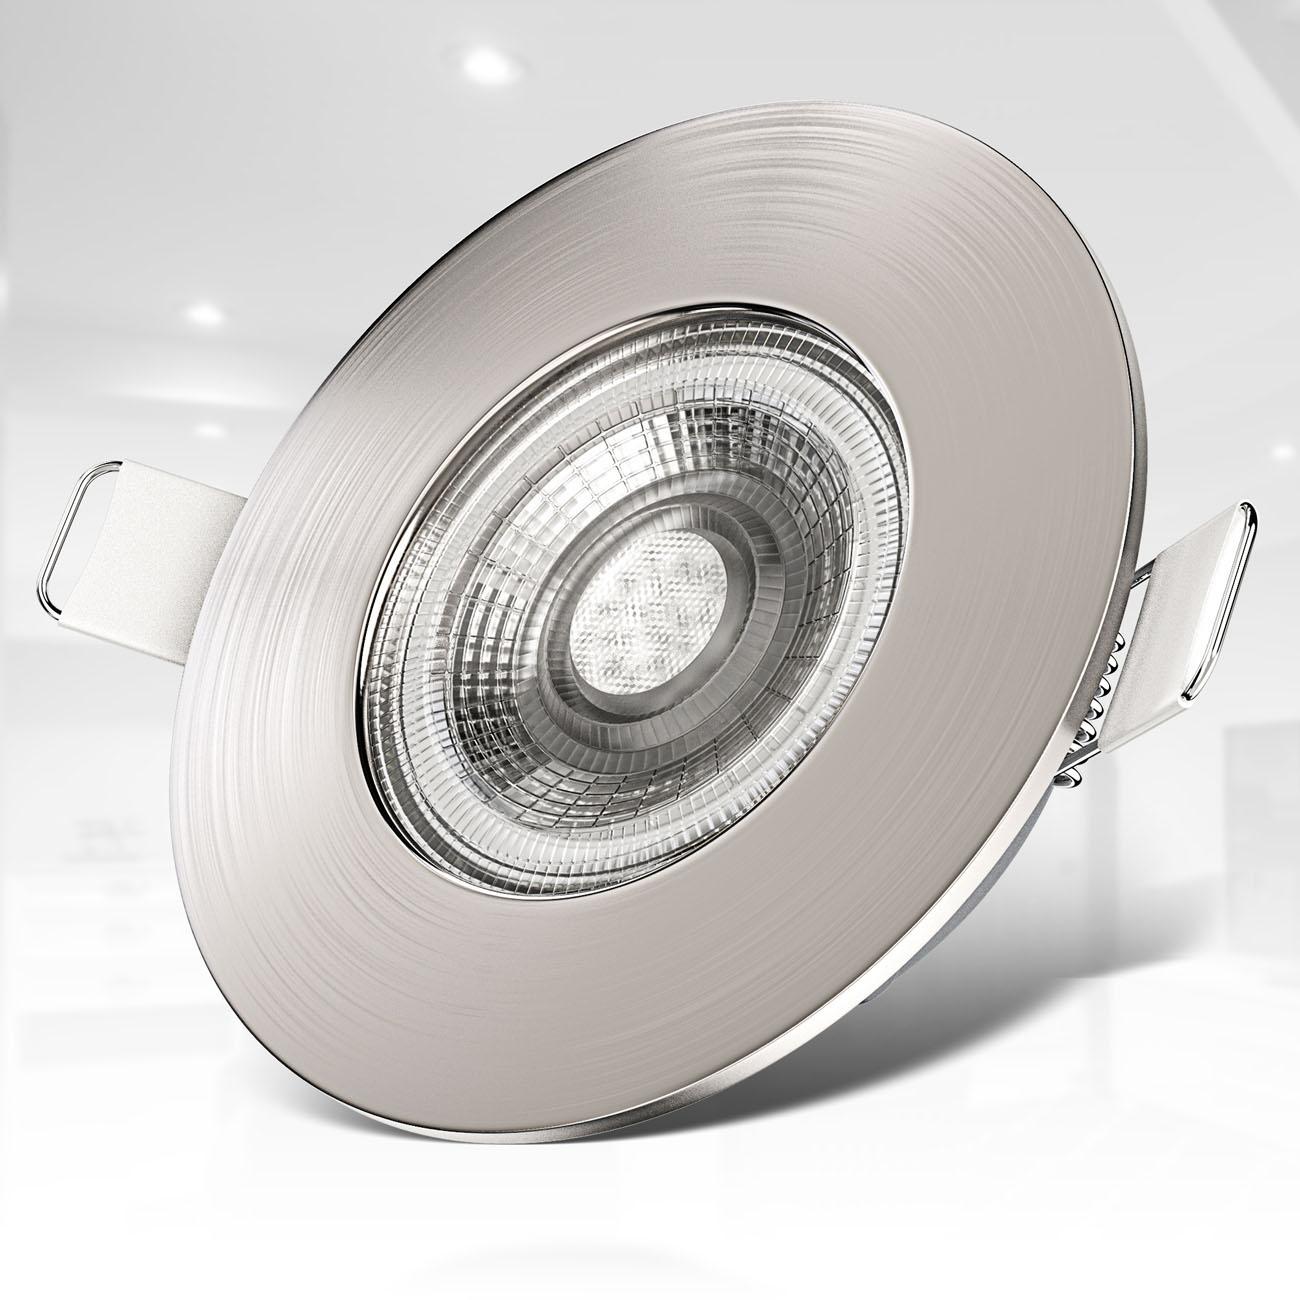 LED Einbaustrahler | Bad Einbauleuchte 3er SET | ultra flach 5W IP44 dimmbar - 4